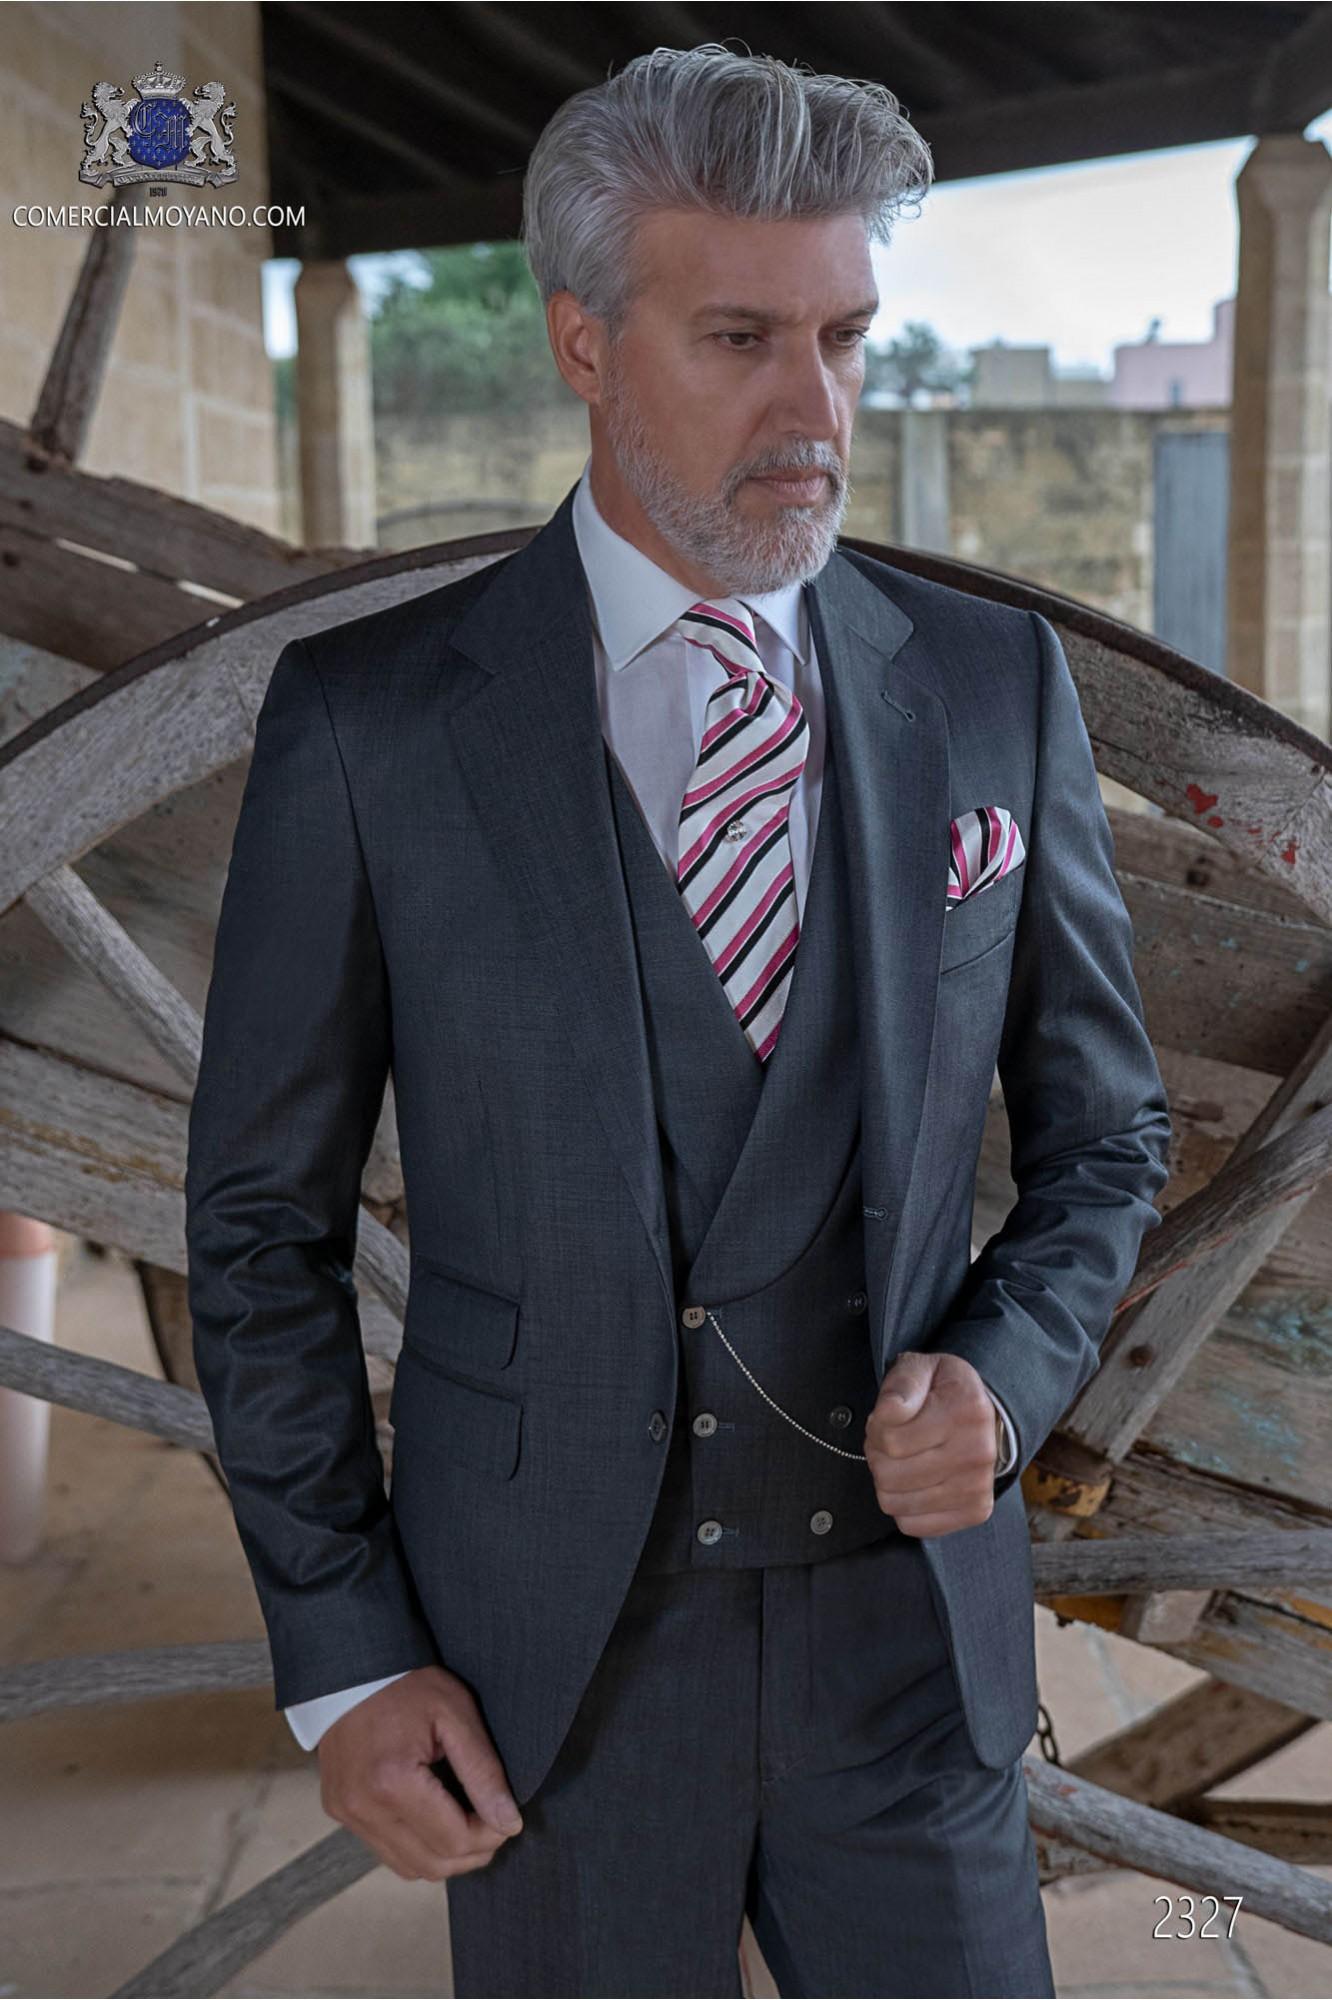 Italian bespoke suit anthracite gray fil a fil wool mix